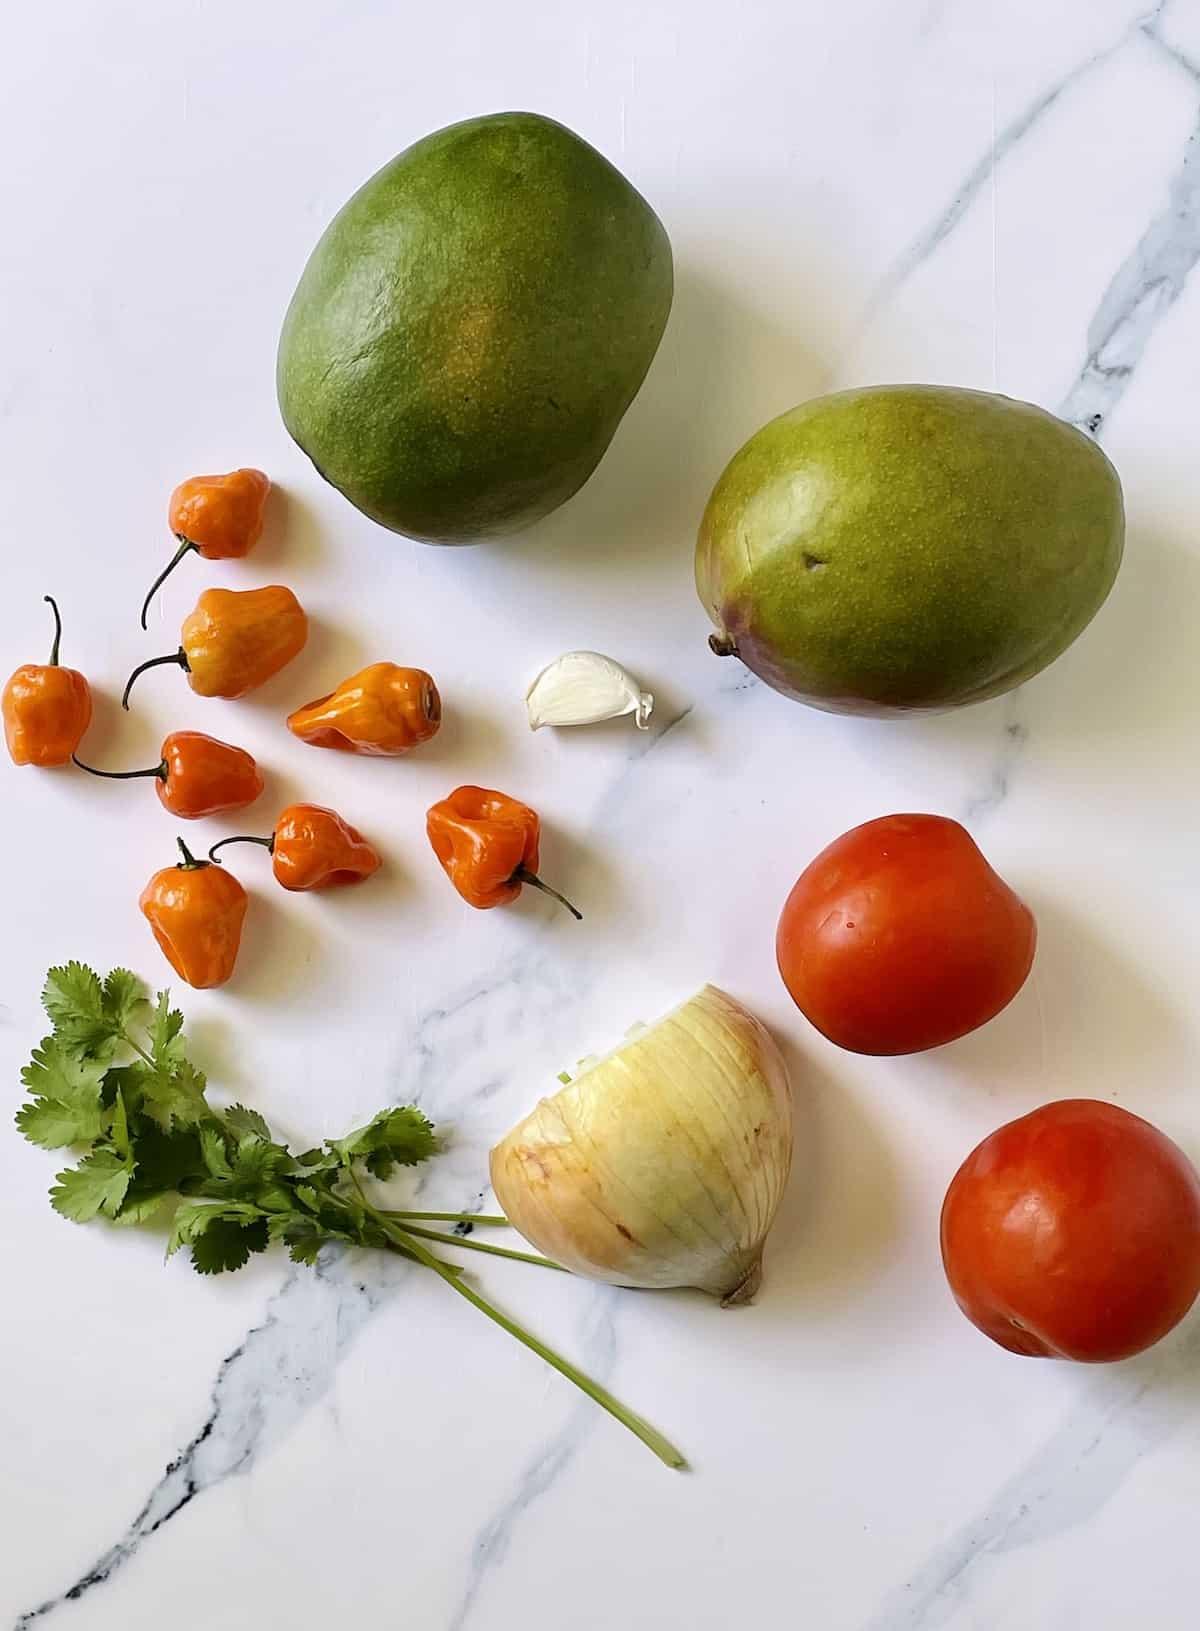 mango, habanero pepper, tomatoes, onion, garlic, and cilantro on a white cutting board